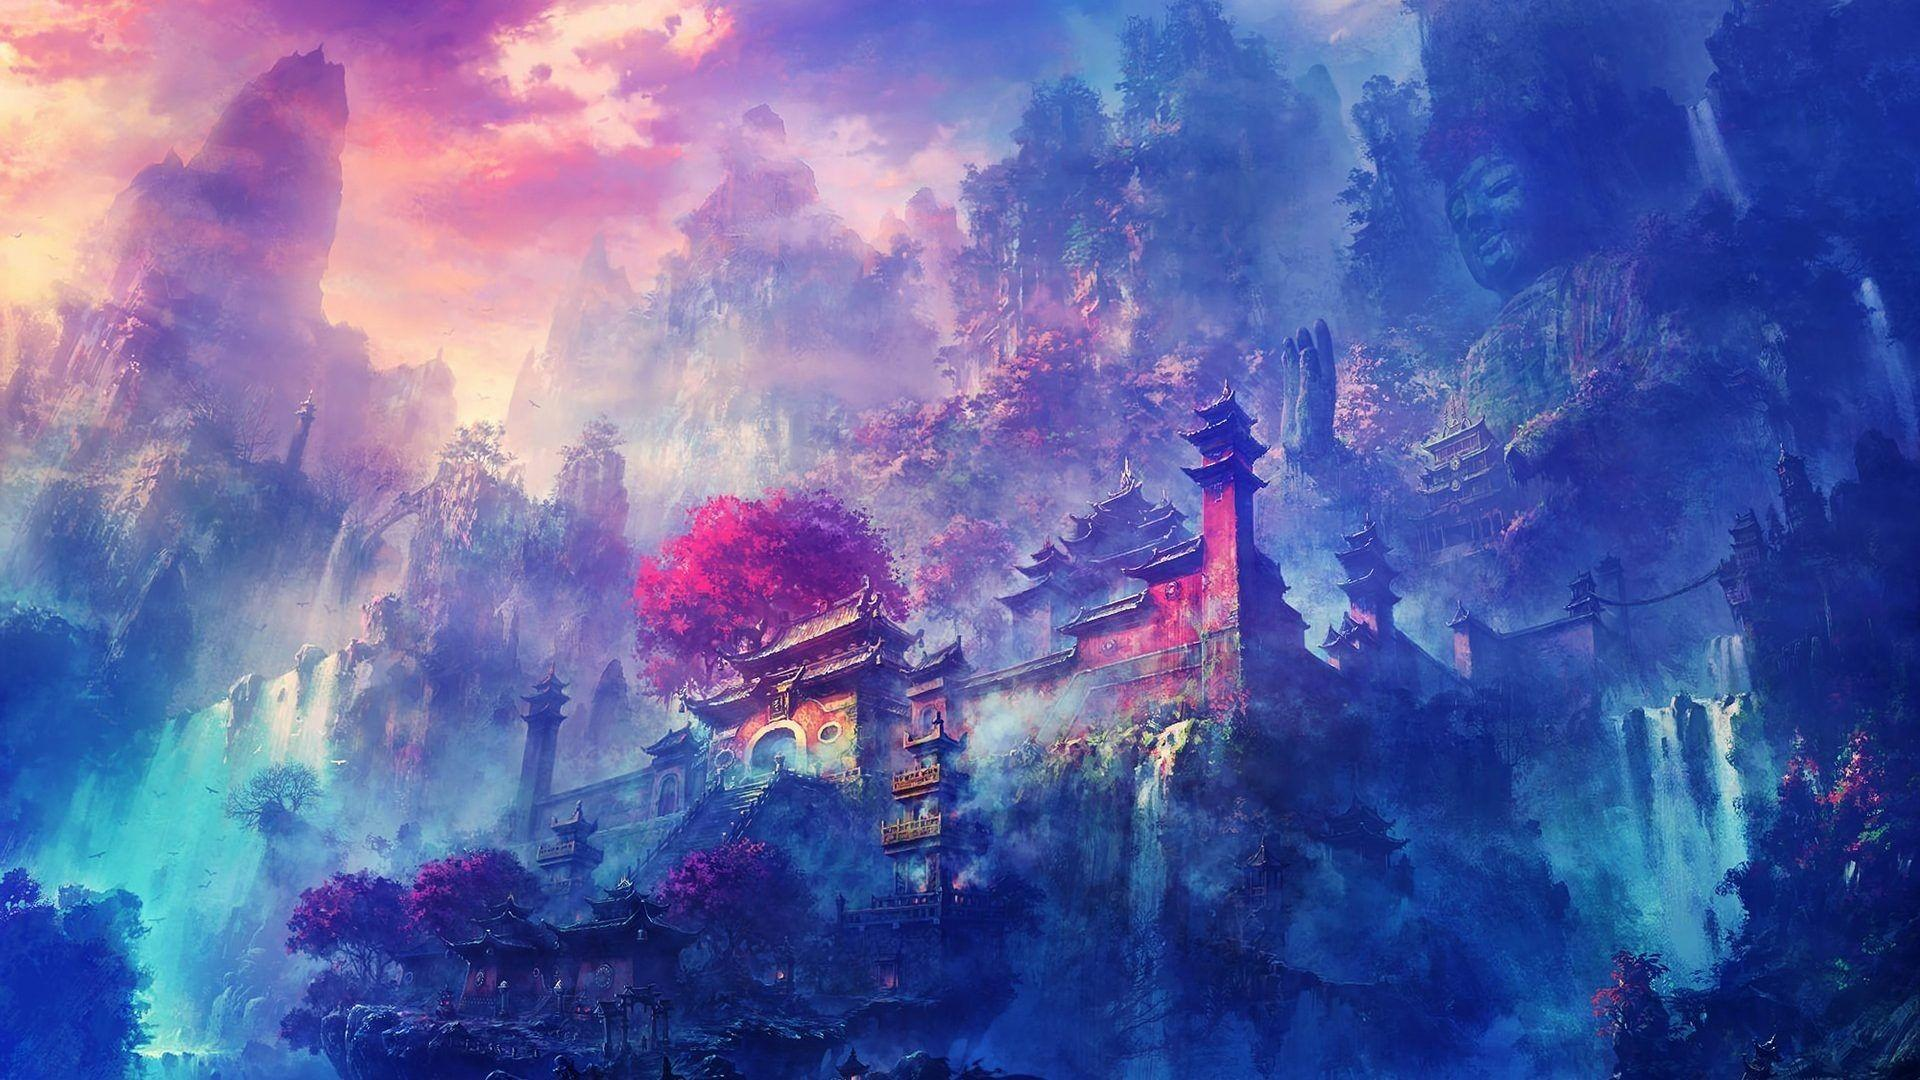 Anime Artwork Landscape 4k Wallpapers Wallpaper Cave